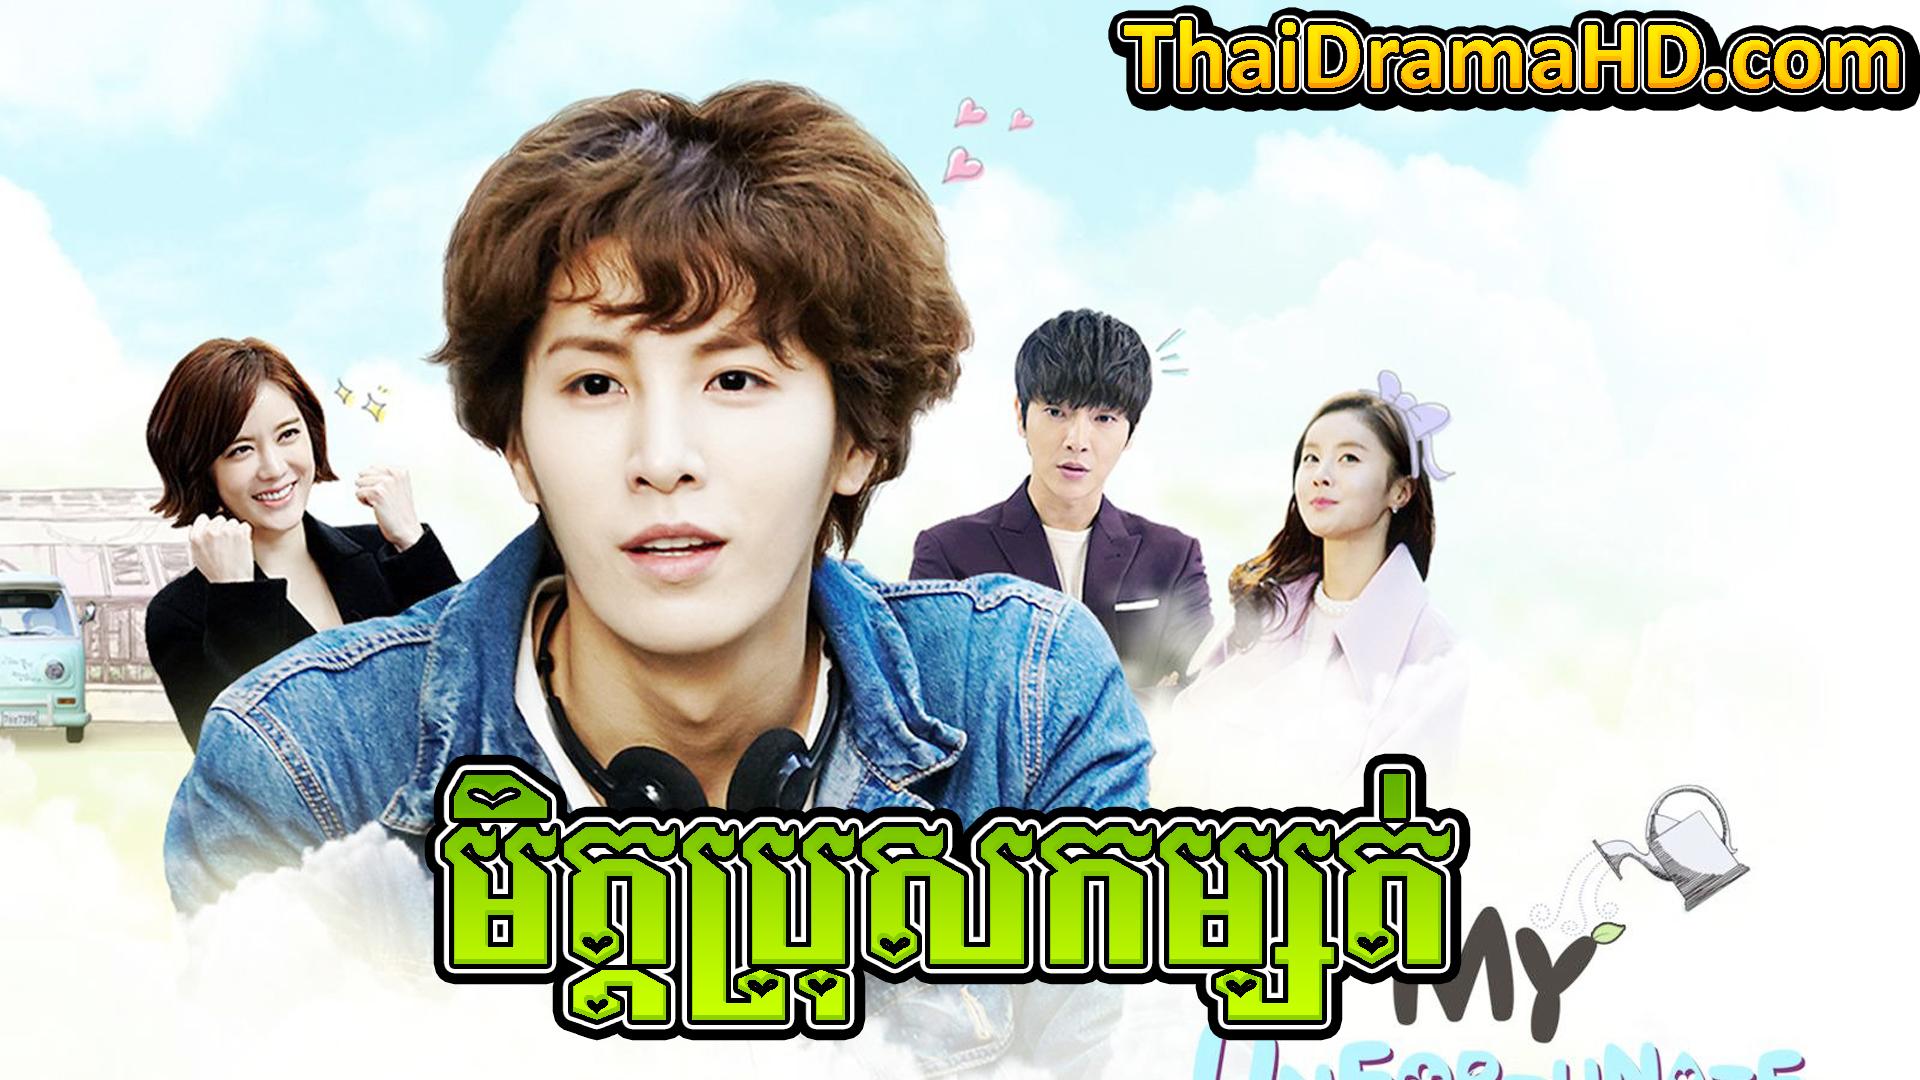 Mith Pros Kamsoth | Thai Drama | Khmer Movie | Phumikhmer | movie-khmer | video4khmer | khmotions | kolabkhmer | khmer drama | ksdrama | cookingtips | roscheat | khmertimeskh | khmerkomsan | phumi7 | merlkon | film2us | movie2kh | sweetdrama | khmercitylove | khreplay | tvb cambodia drama | ckh7 | srokthai | phumimedia | phumi8 | khmer avenue | khmer search | Soyo | khmerfans